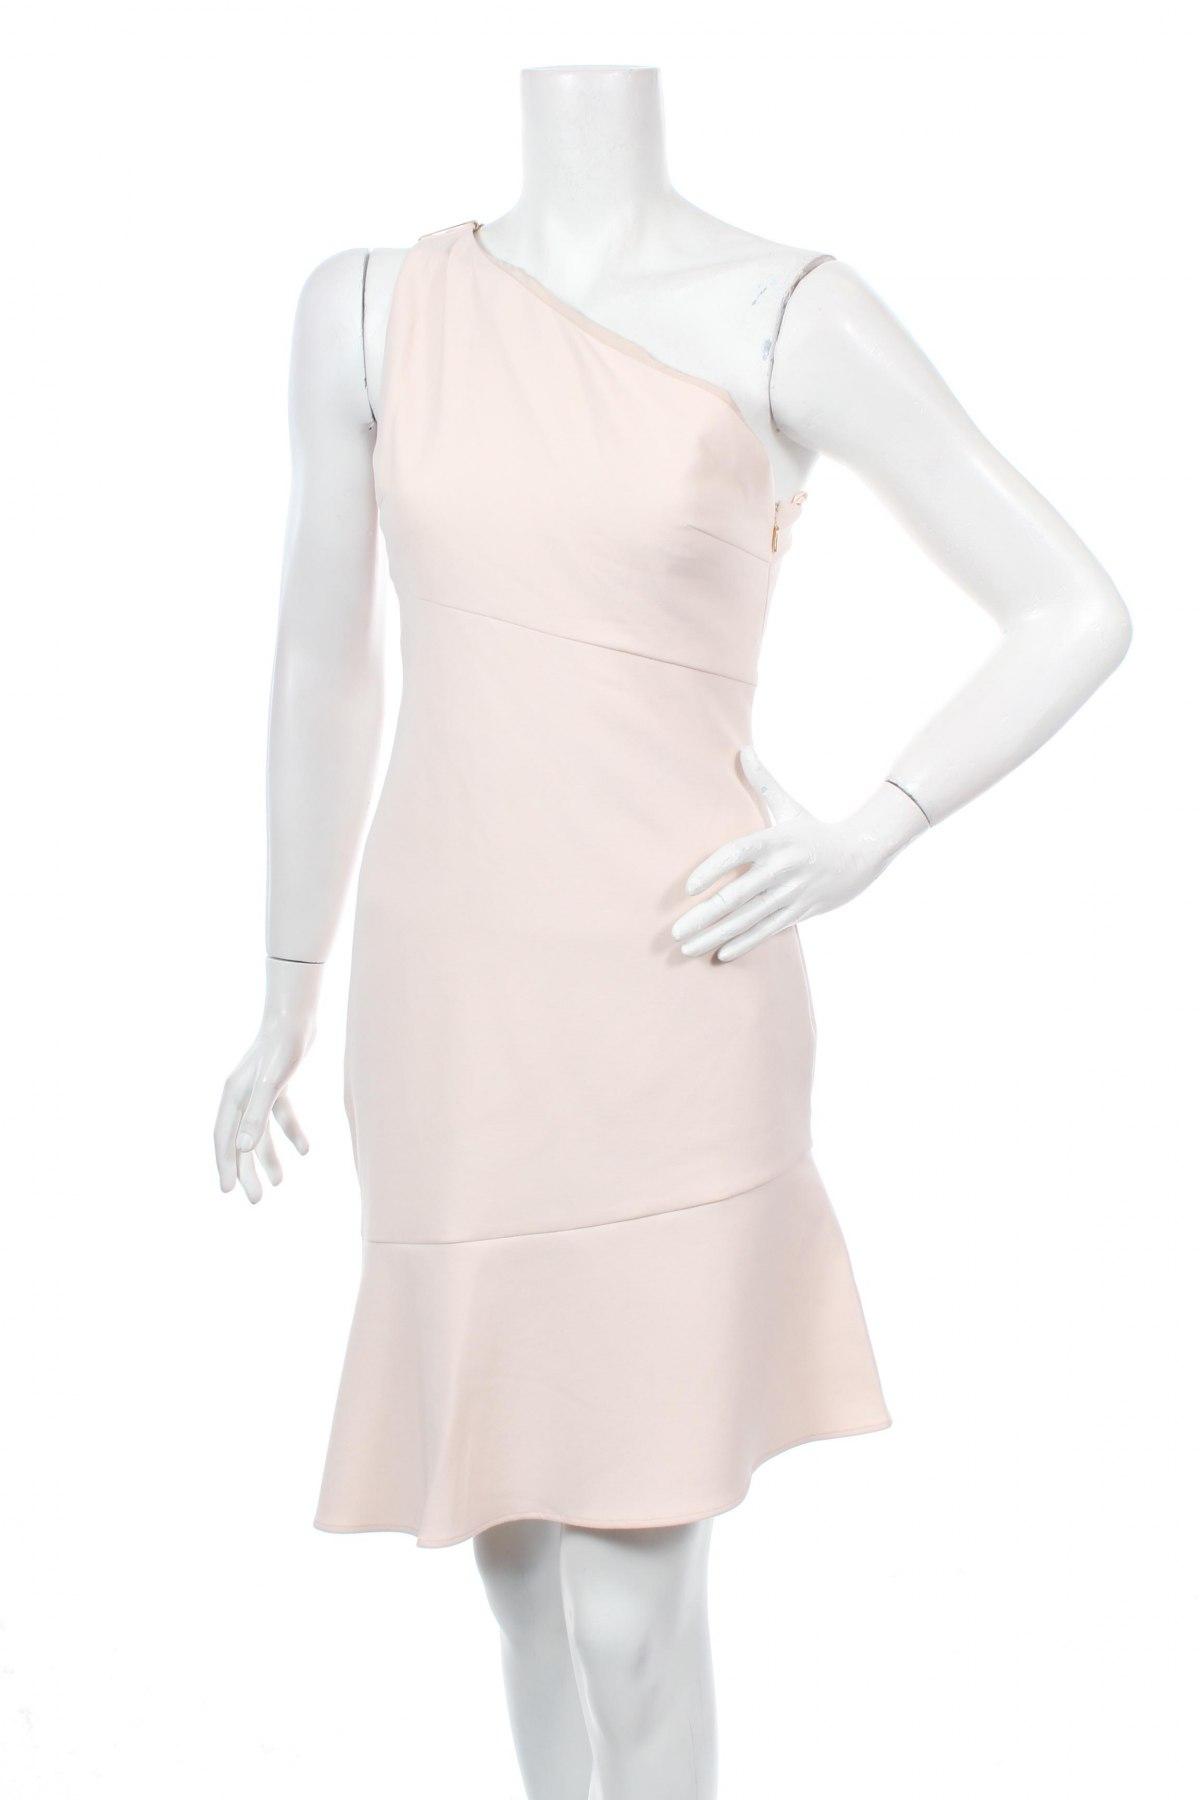 7440e2b60 Dámske Šaty - nakupujte za východné ceny.